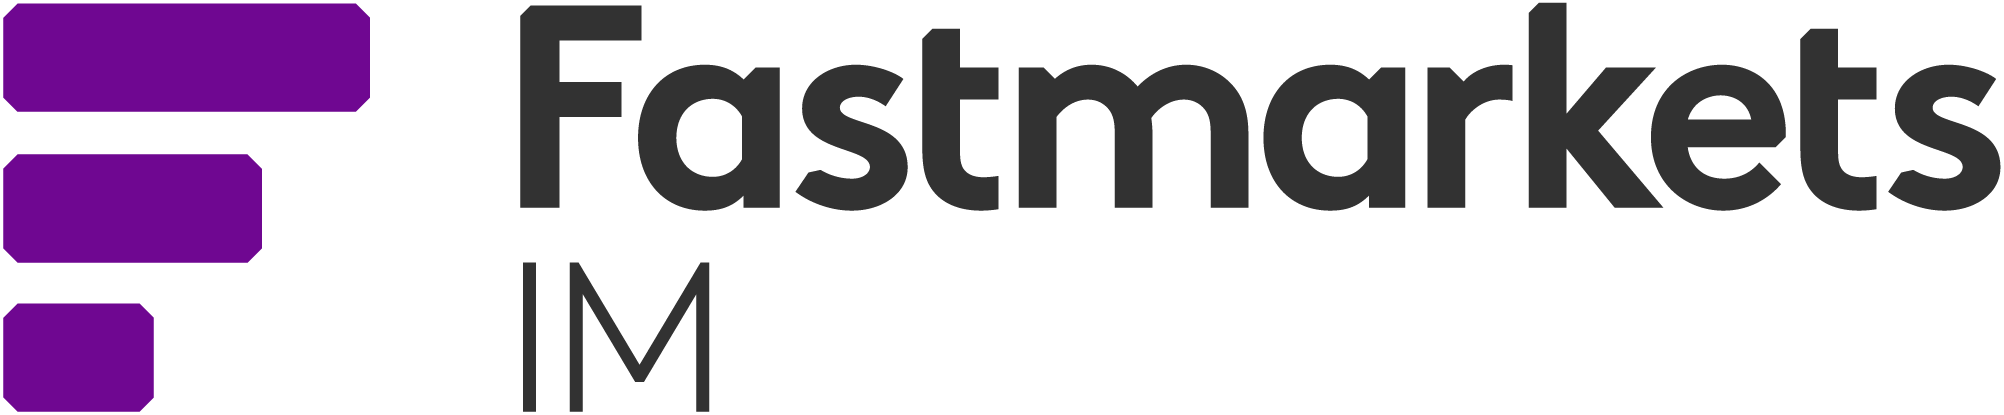 Fastmarkets_IM_Logo_Primary_RGB-01 (1)